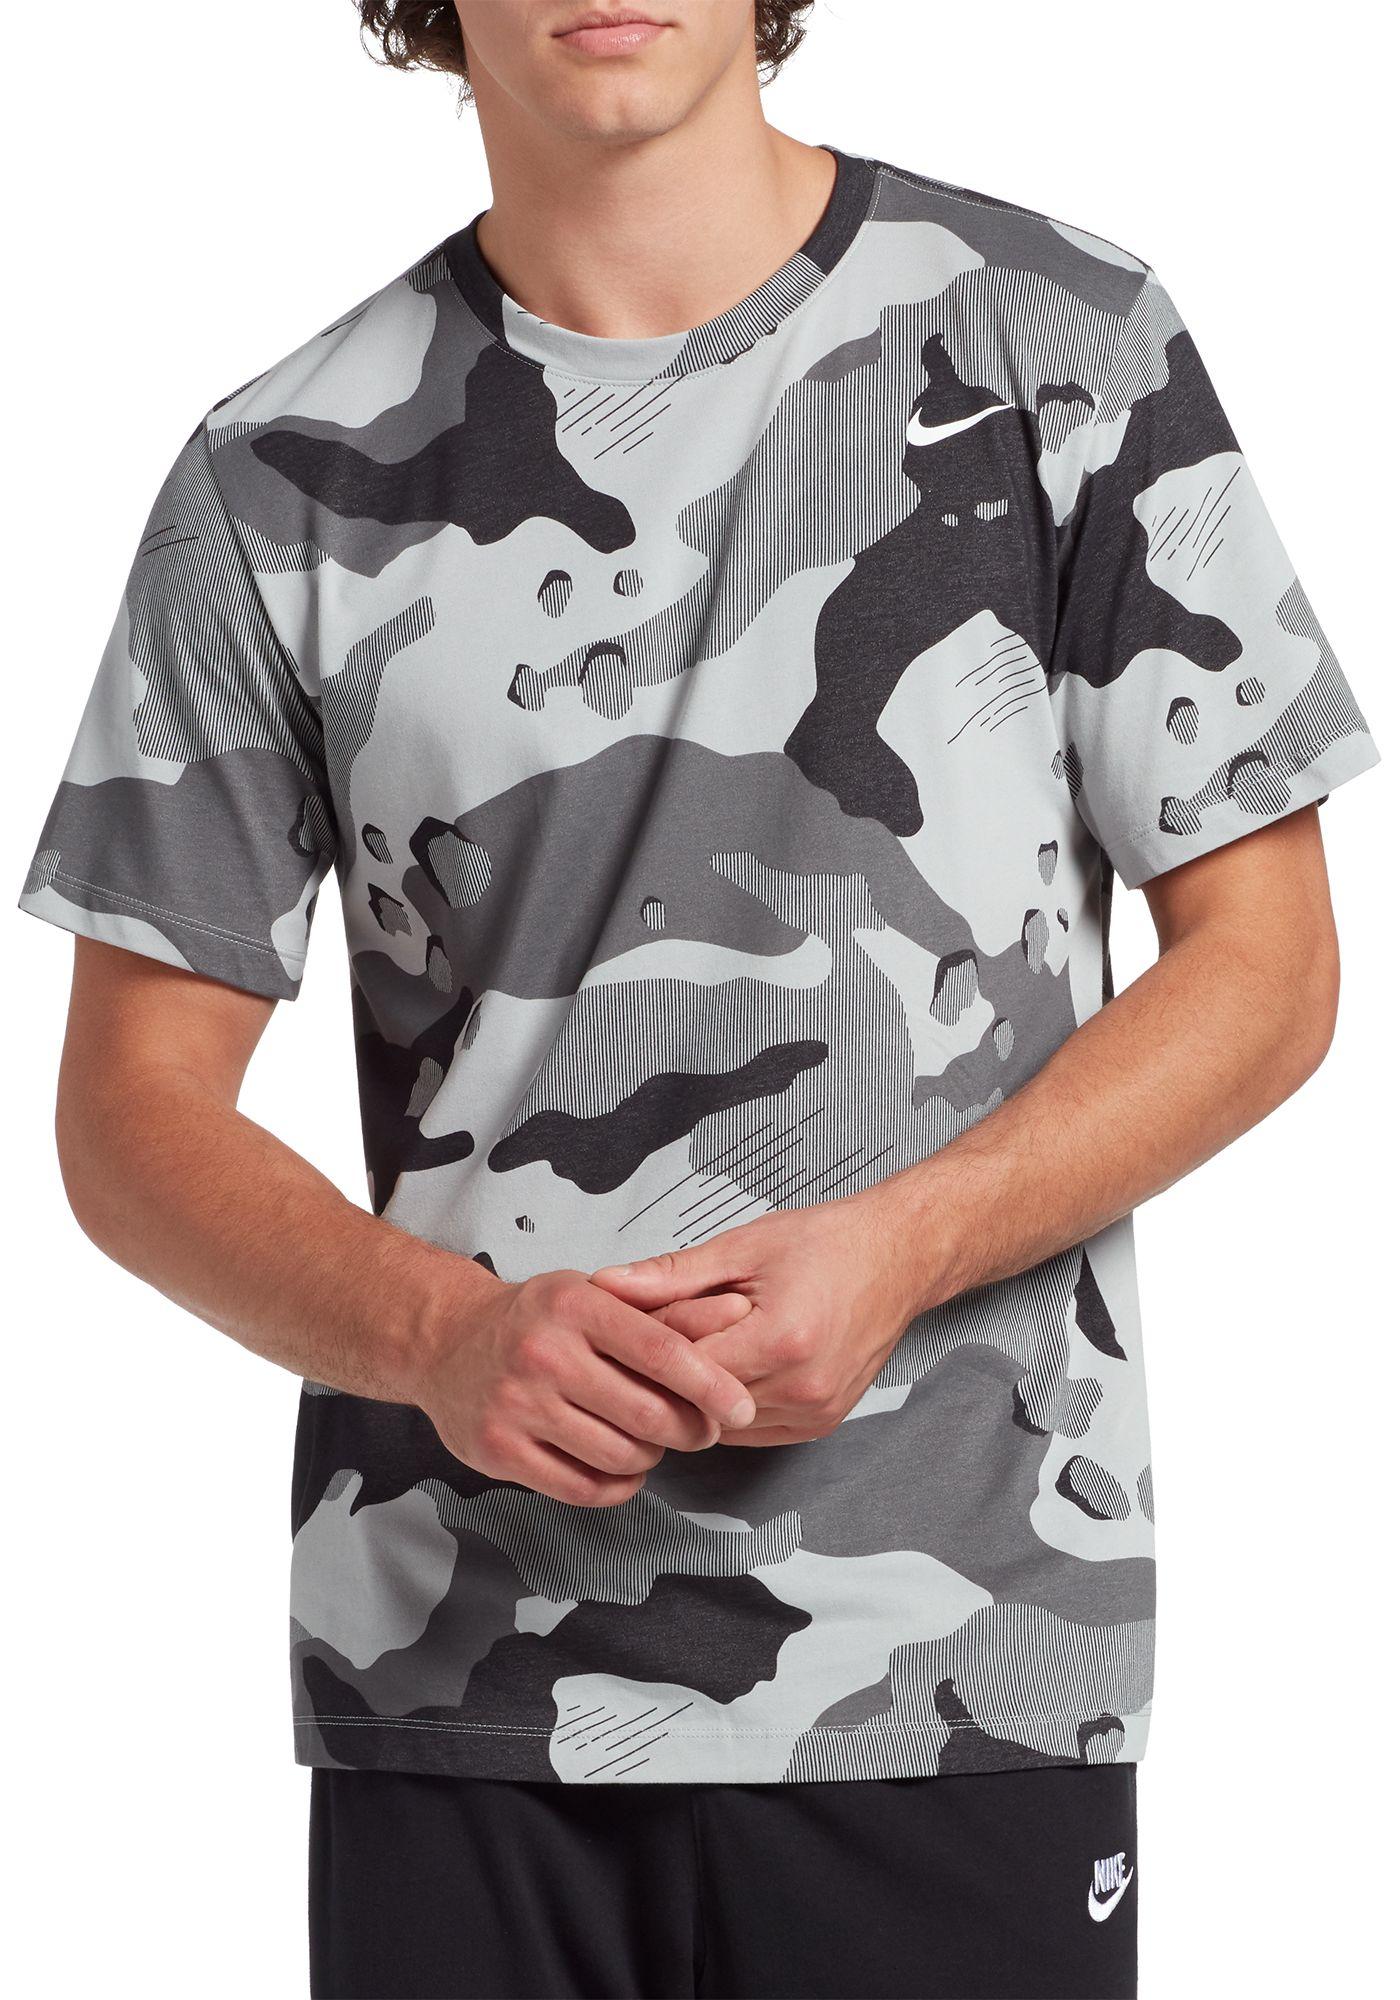 Nike Men's Dri-FIT Camo Training T-Shirt